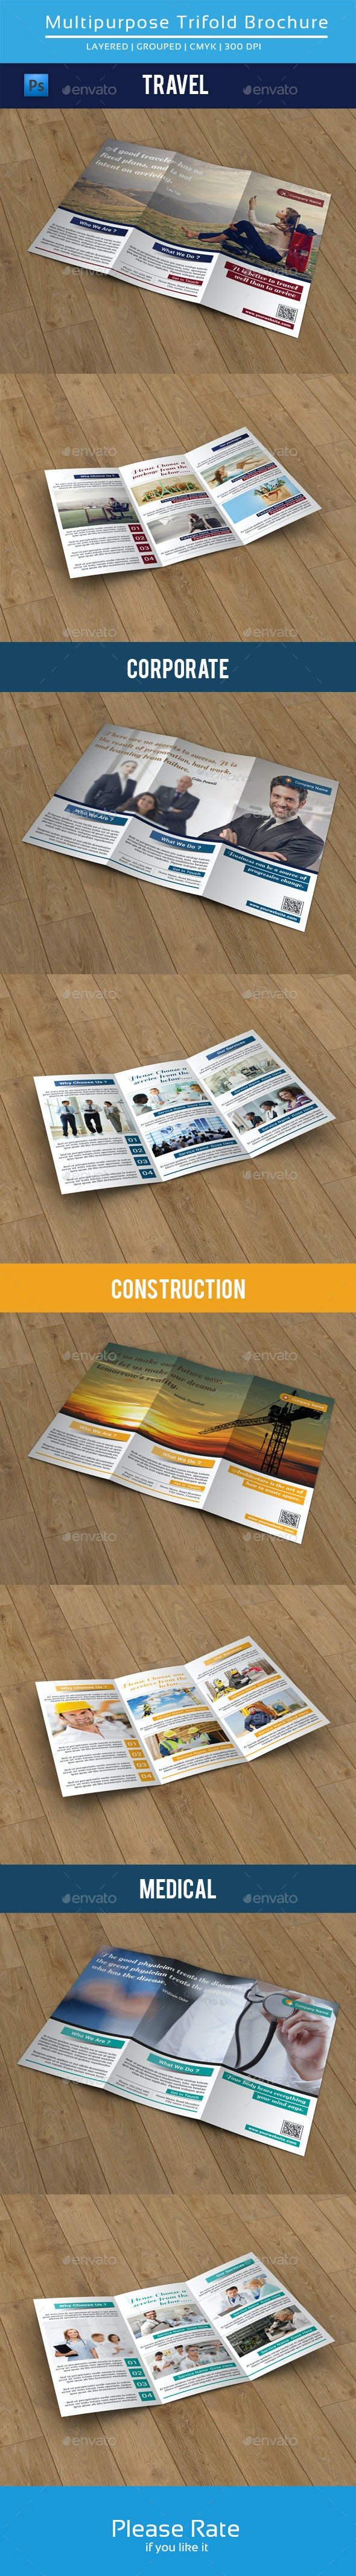 Clean Multipurpose Trifold Brochure-V79 - Corporate Brochures